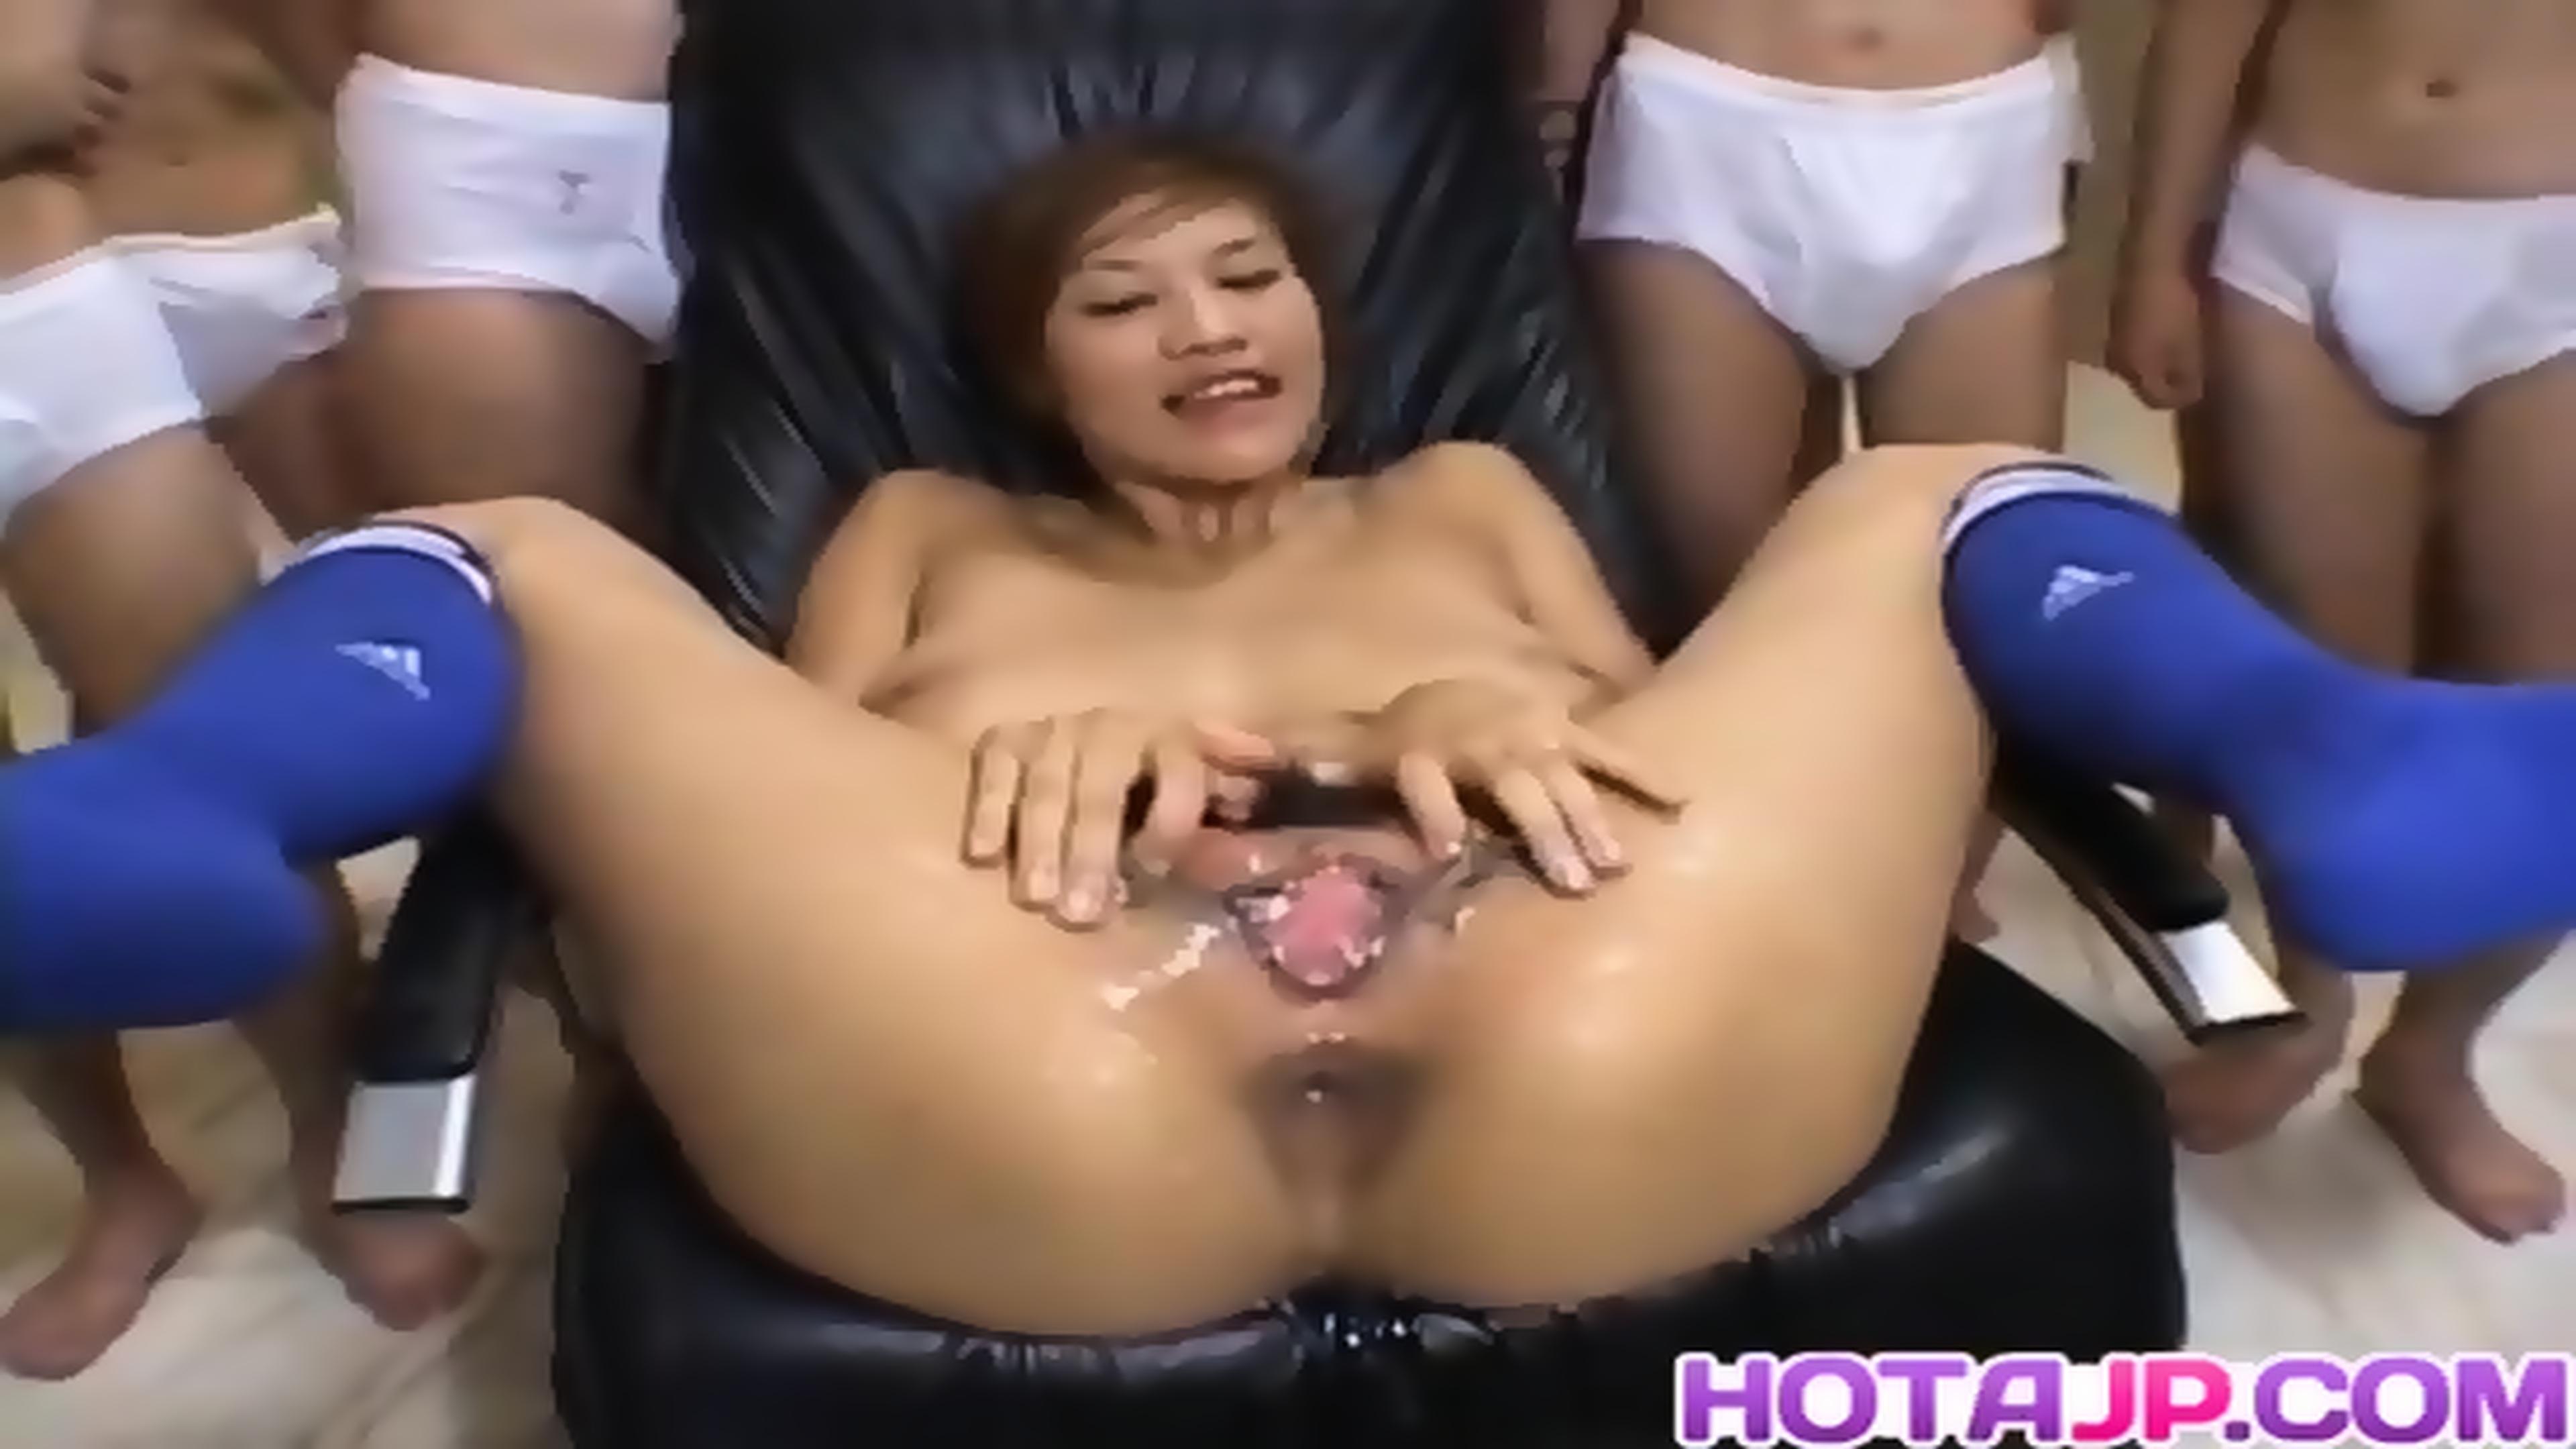 Kinky midget gallery